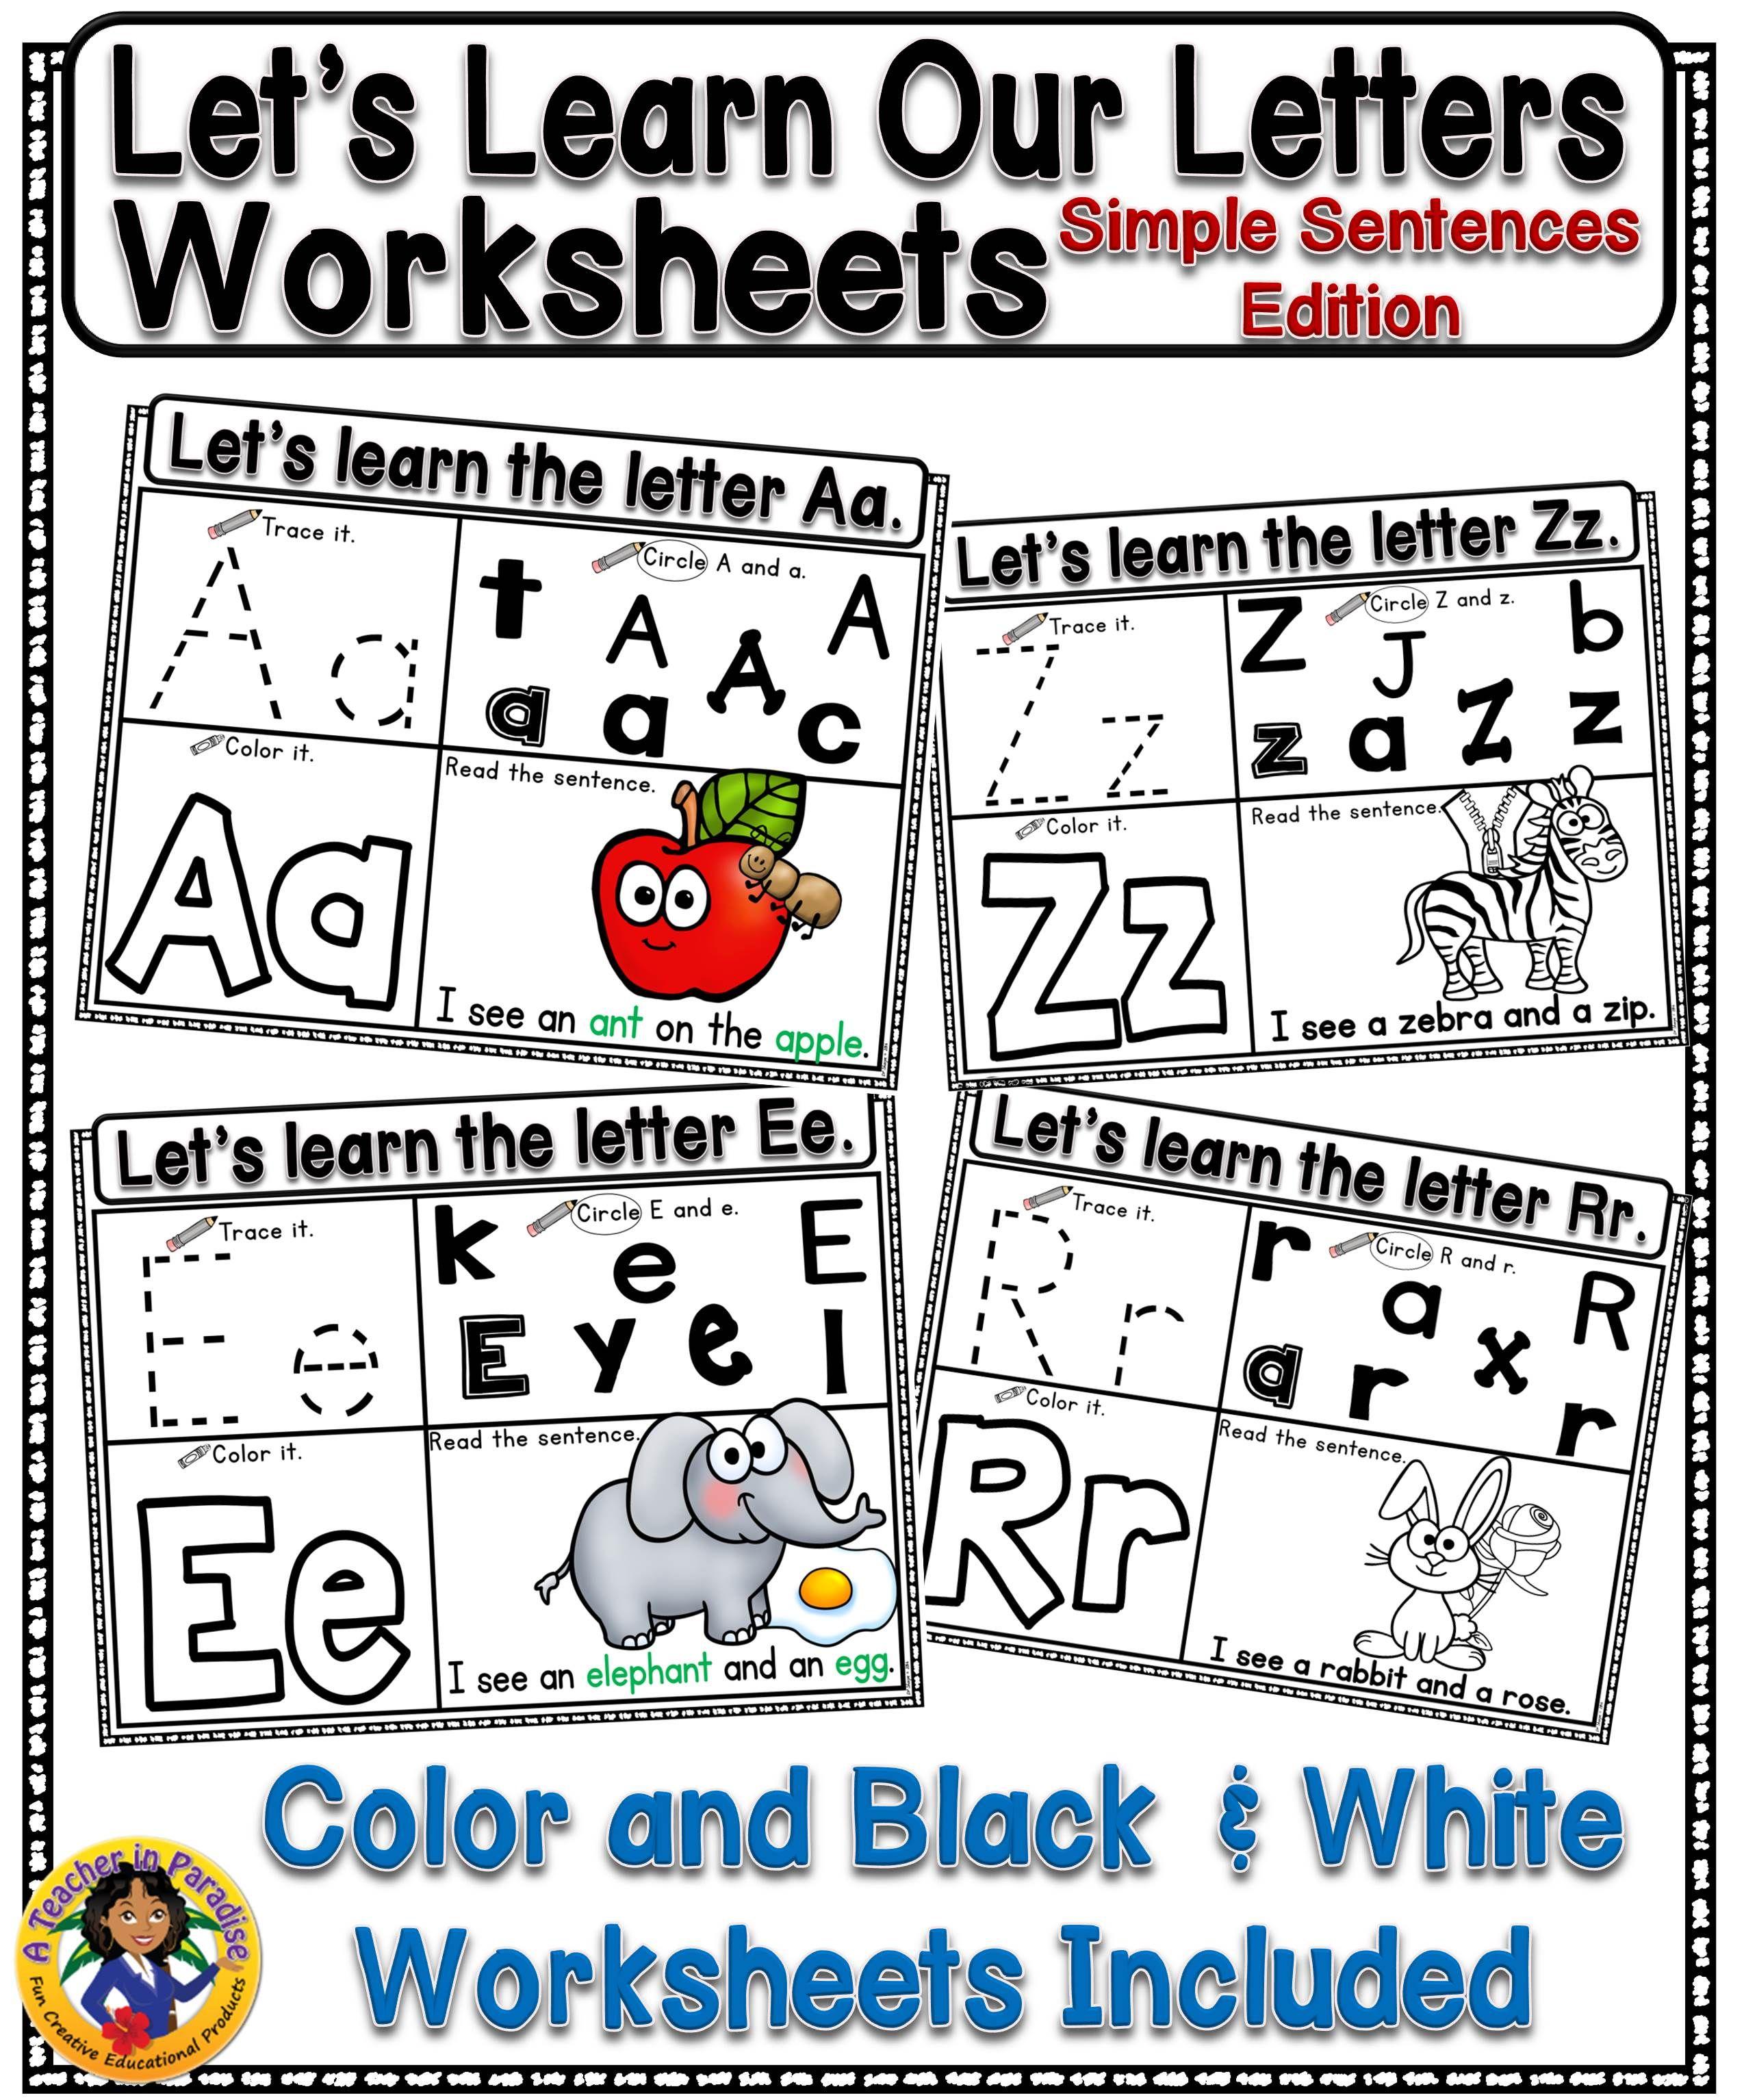 Let S Learn Our Letters Simple Sentences Edition